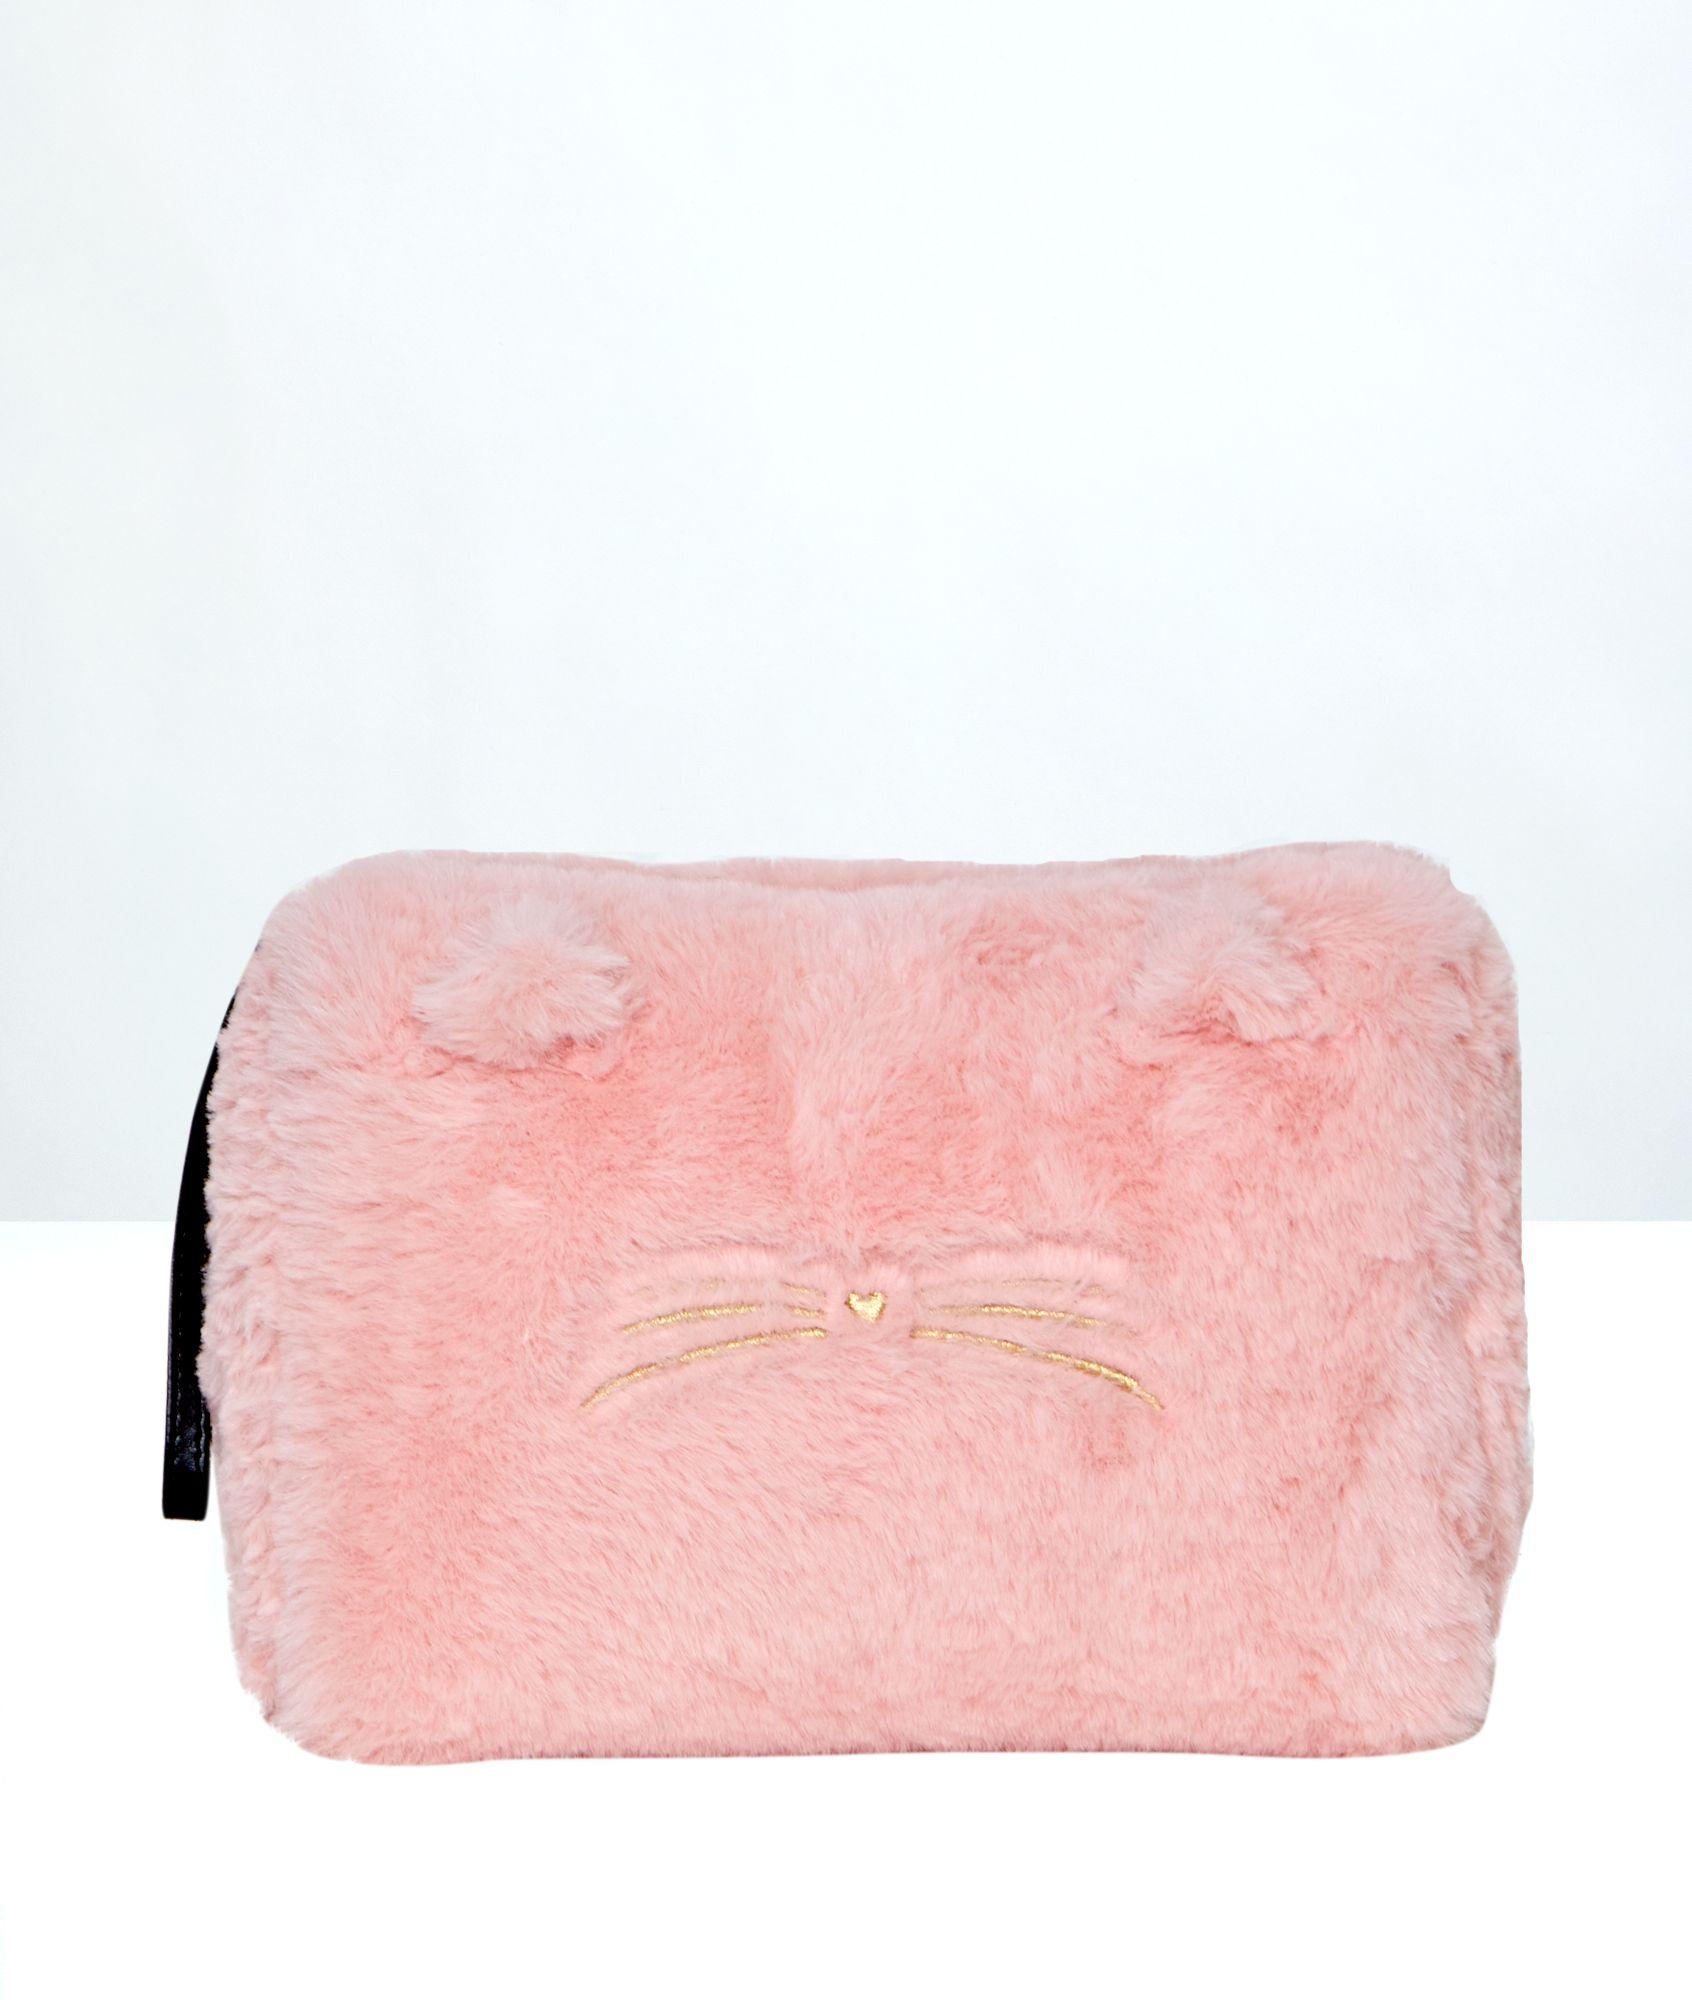 3fa85825d Neceser tejido peluche - FUR BAG - TROUSSE - ROSA - Etam | Bags ...